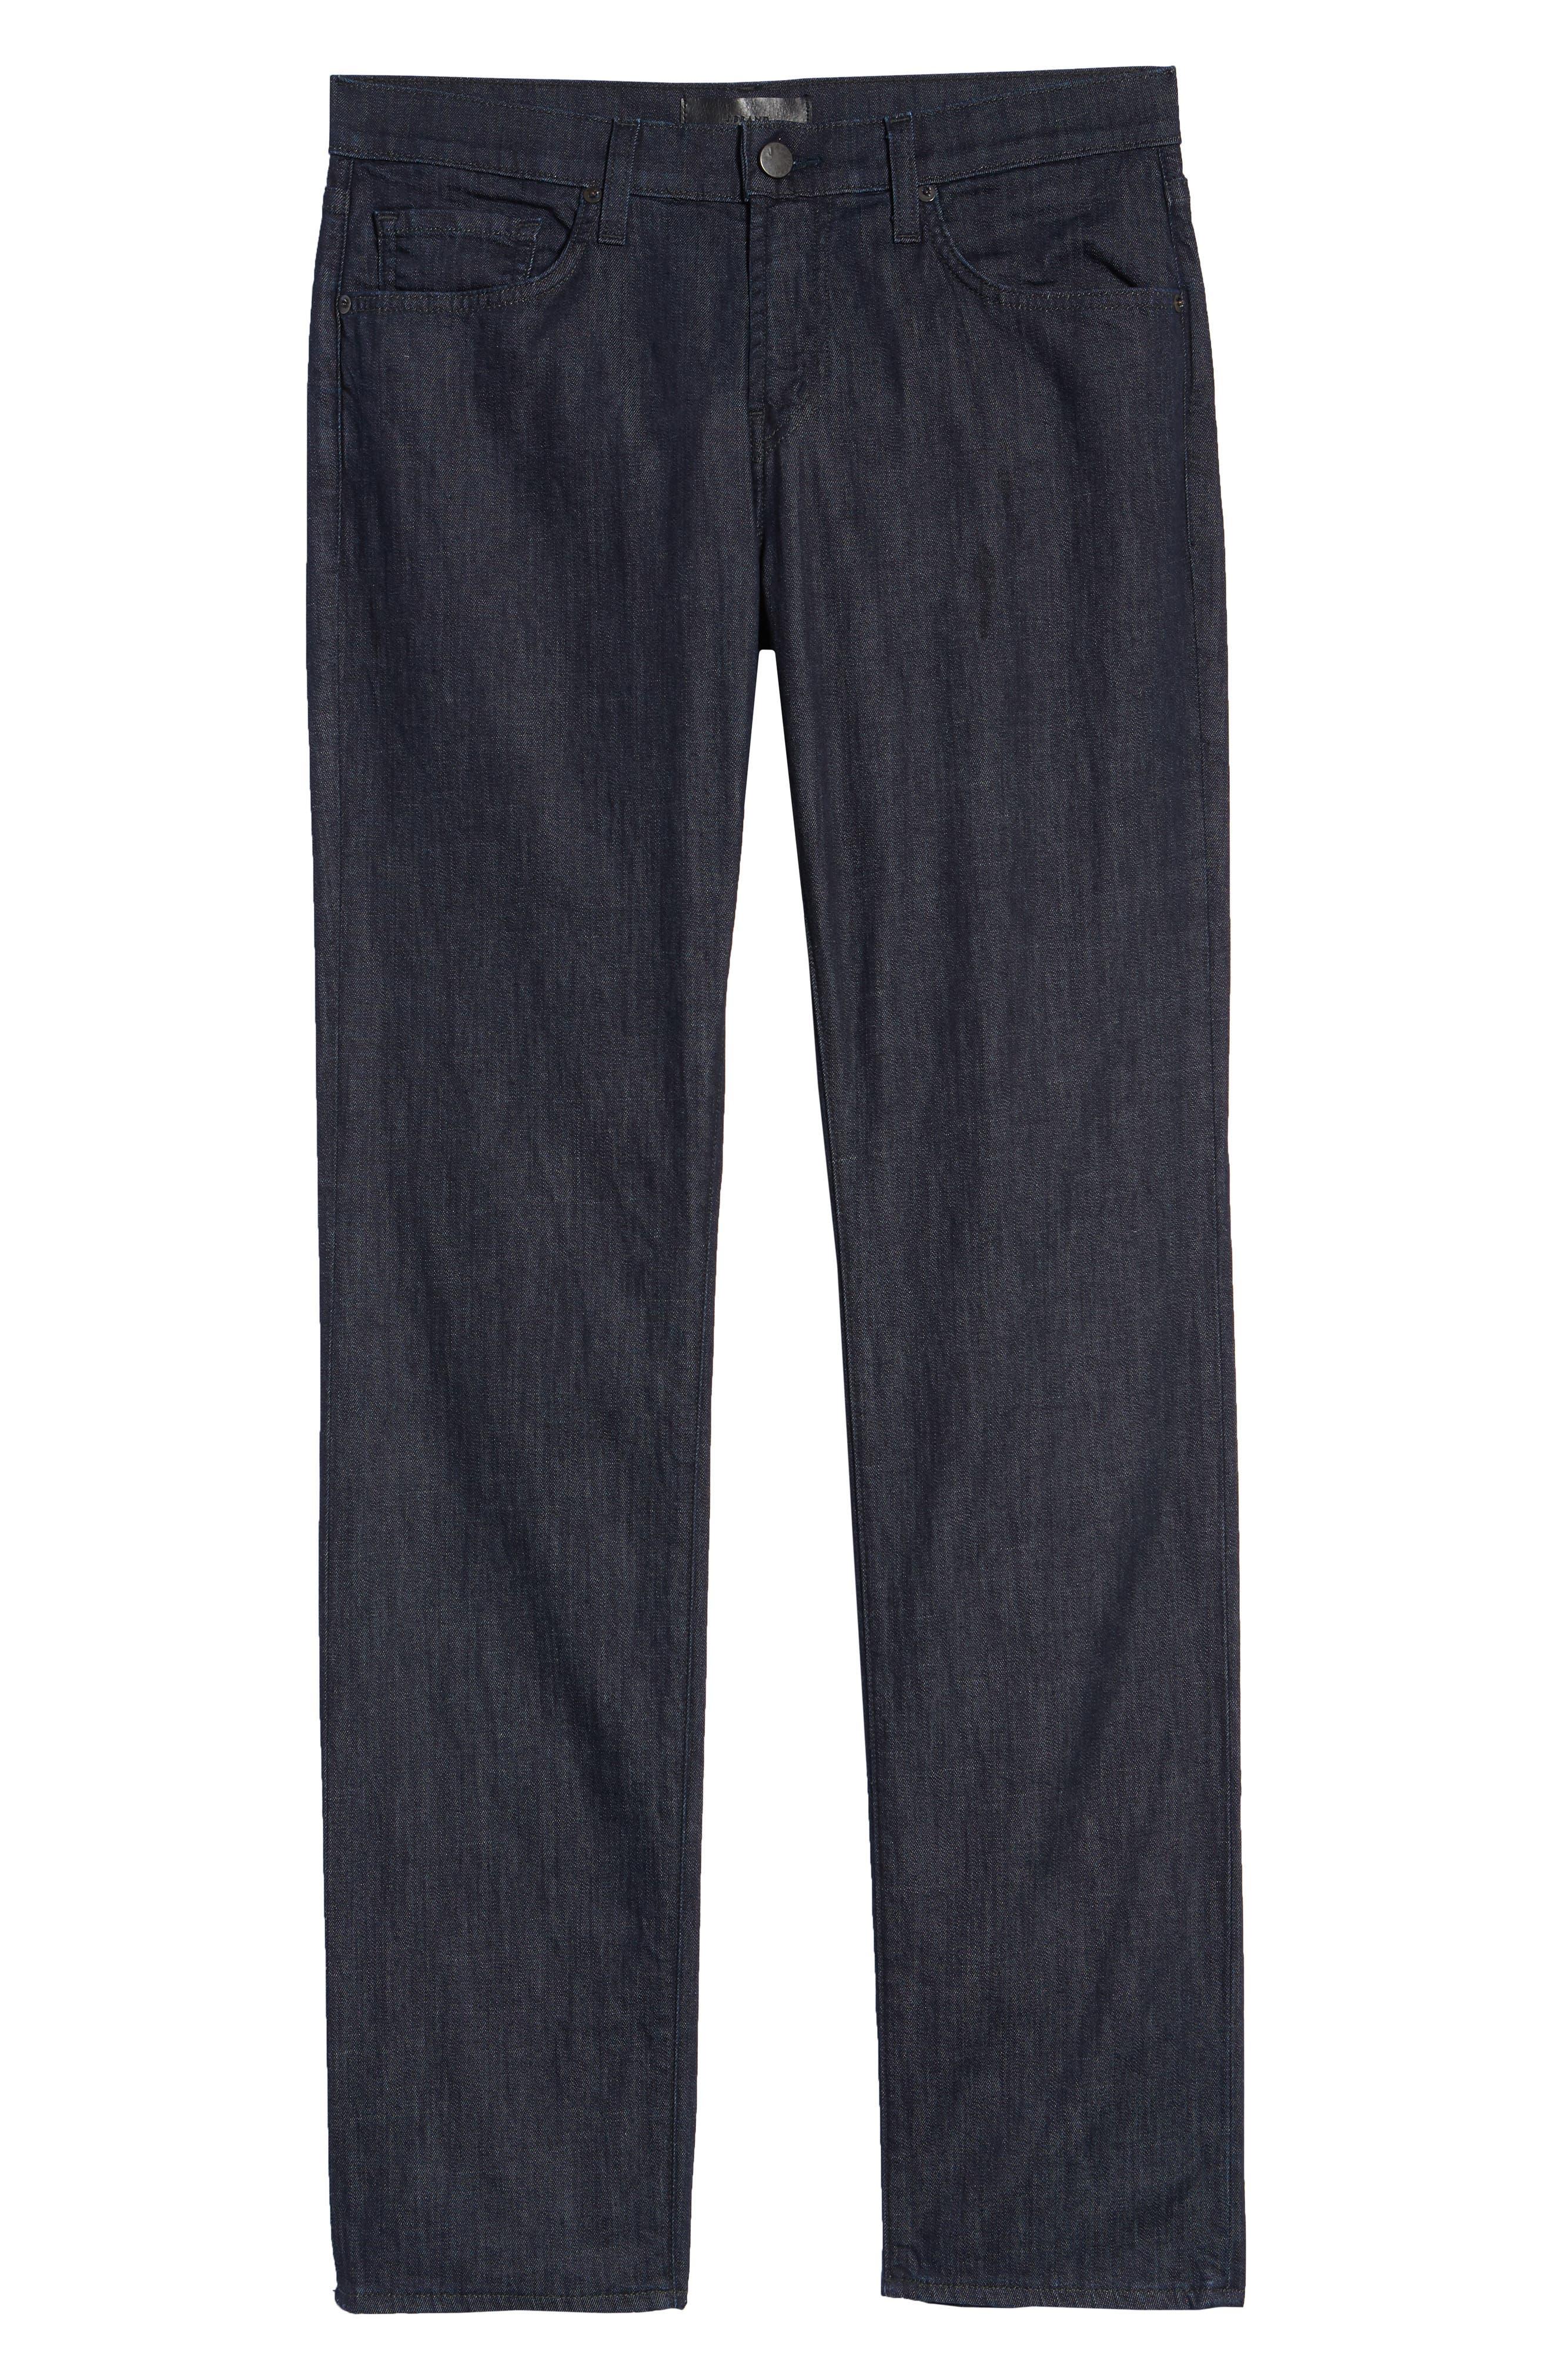 Kane Slim Straight Leg Jeans,                             Alternate thumbnail 2, color,                             HIRSCH